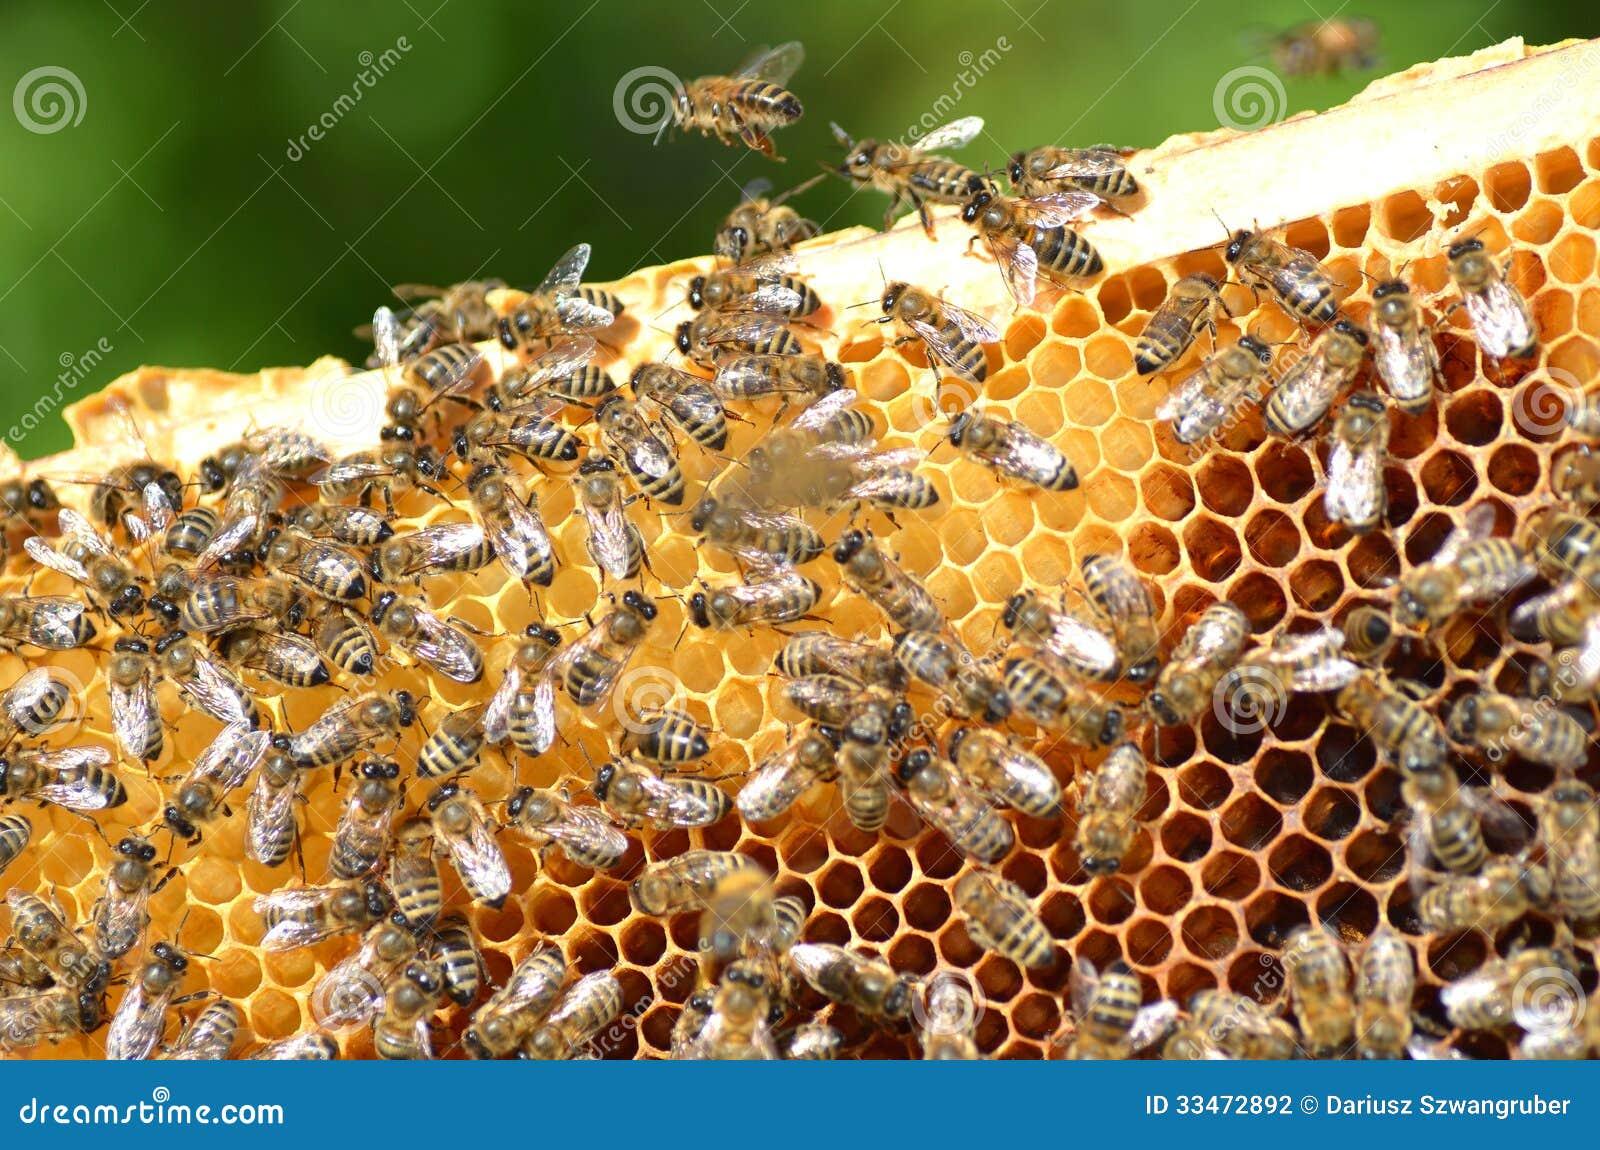 bees honeycomb eating honey 33472892